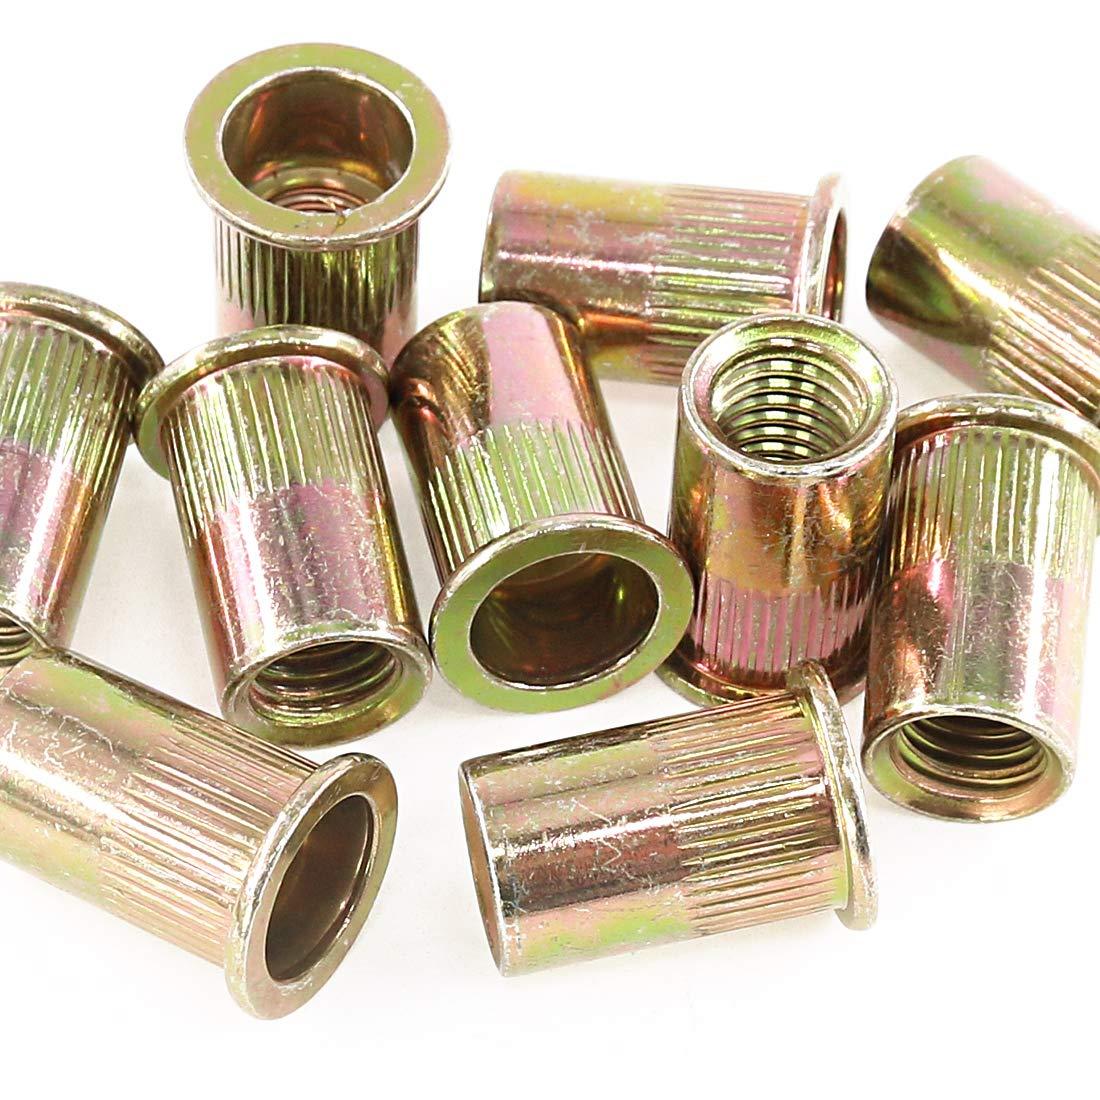 Rustark 50-Pcs 1//2-13UNC Mixed Zinc Plated Carbon Steel Rivet Nut Flat Head Insert Nutsert Assortment Kit